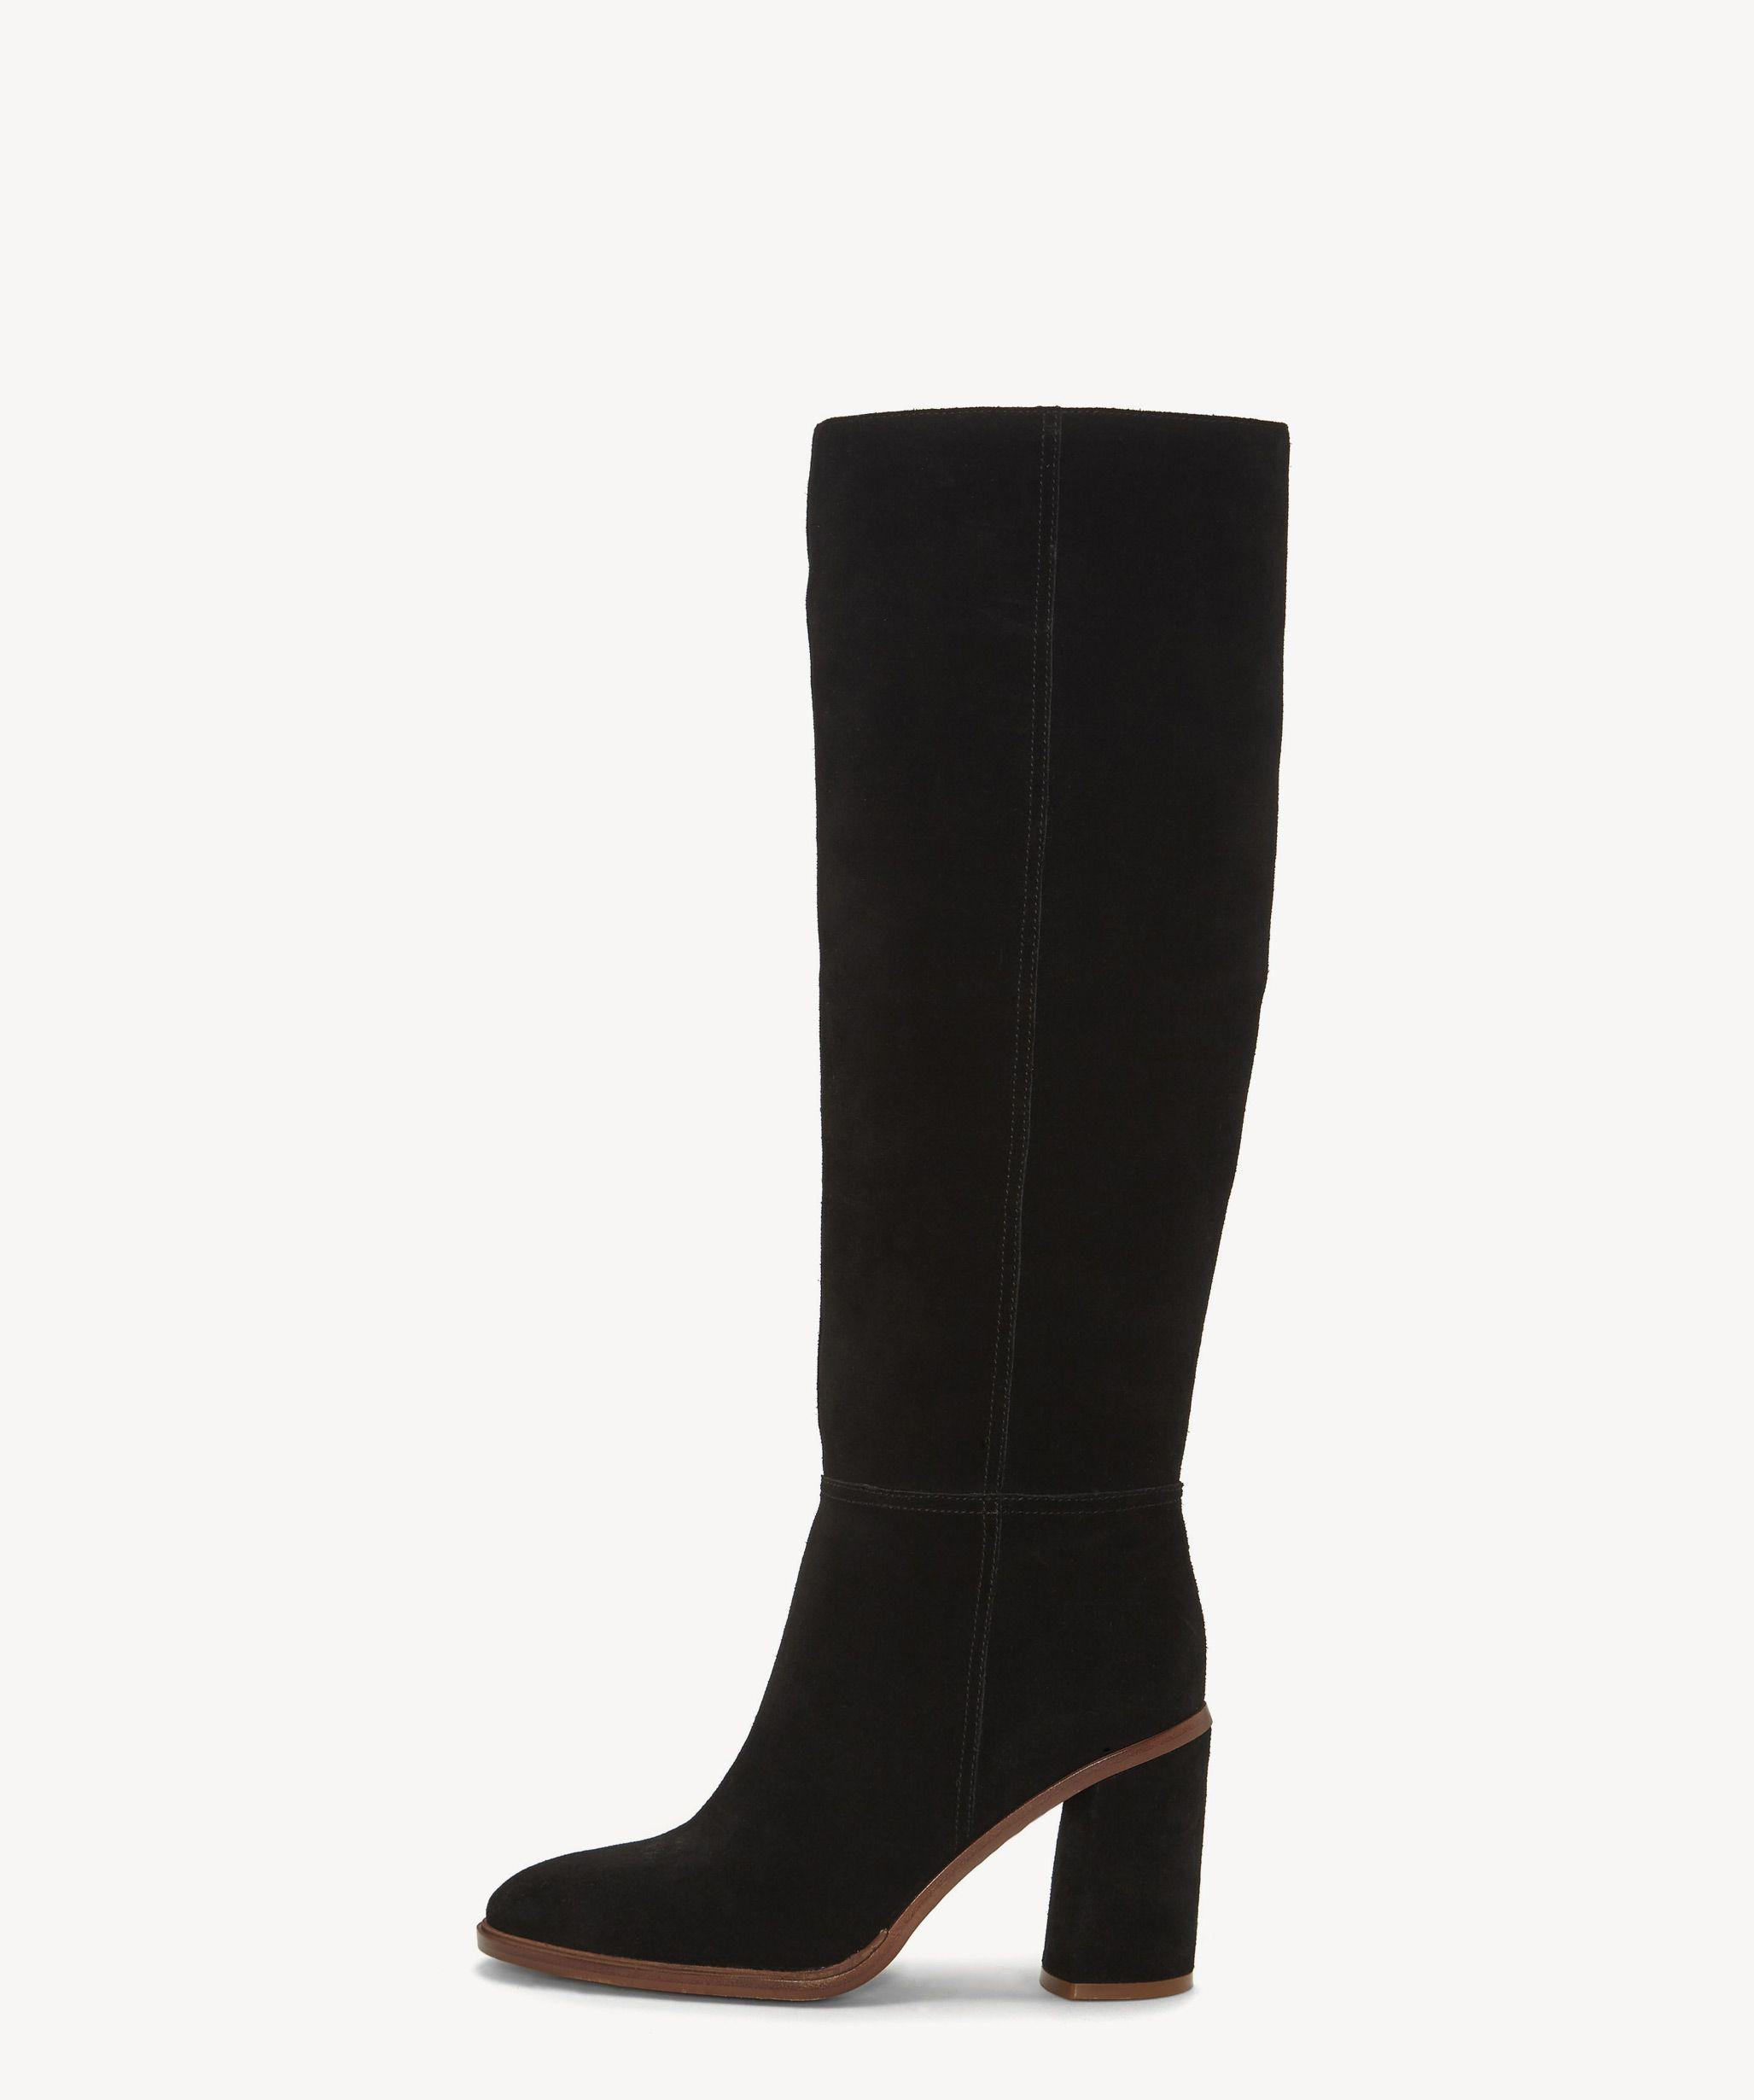 Vince-Camuto-DAMEERA-Knee-High-Block-Heel-Fashion-Dress-Boots thumbnail 6